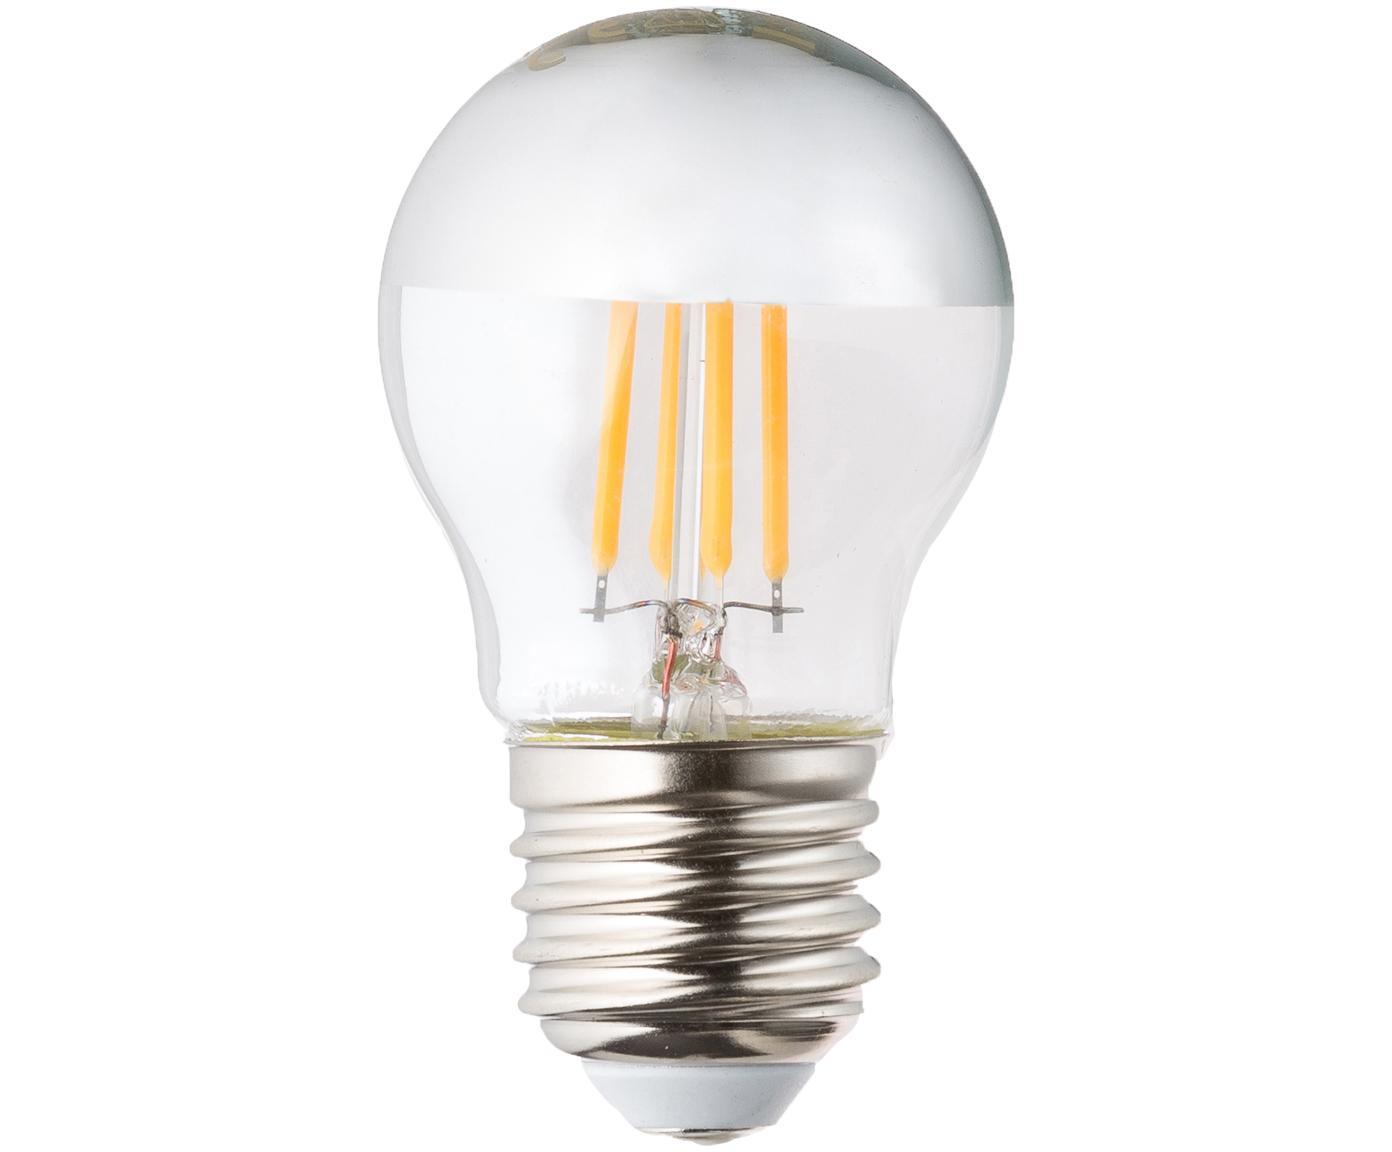 Dimbare lamp Gamiel (E27 / 5W) 3 stuks, Peertje: verchroomd glas, Fitting: aluminium, Transparant, chroomkleurig, Ø 5 x H 8 cm